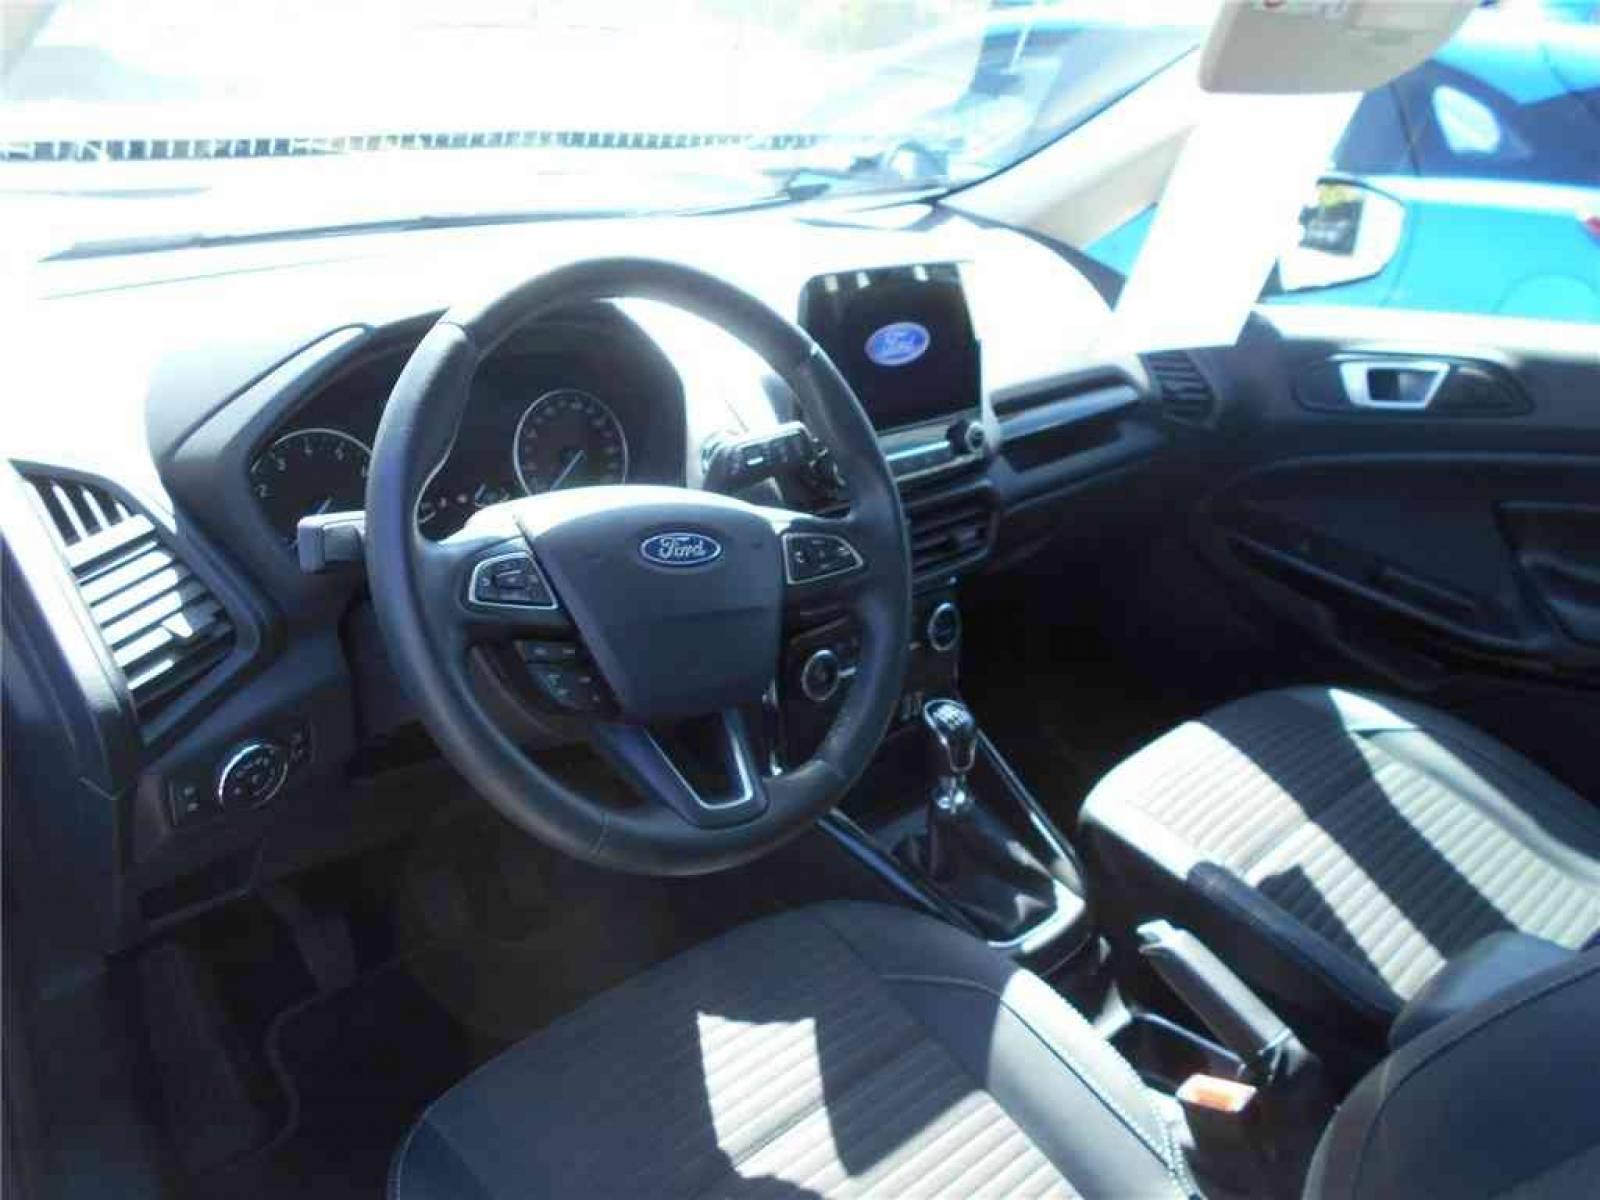 FORD EcoSport 1.0 EcoBoost 125 BVM6 - véhicule d'occasion - Groupe Guillet - Chalon Automobiles - 71100 - Chalon-sur-Saône - 8